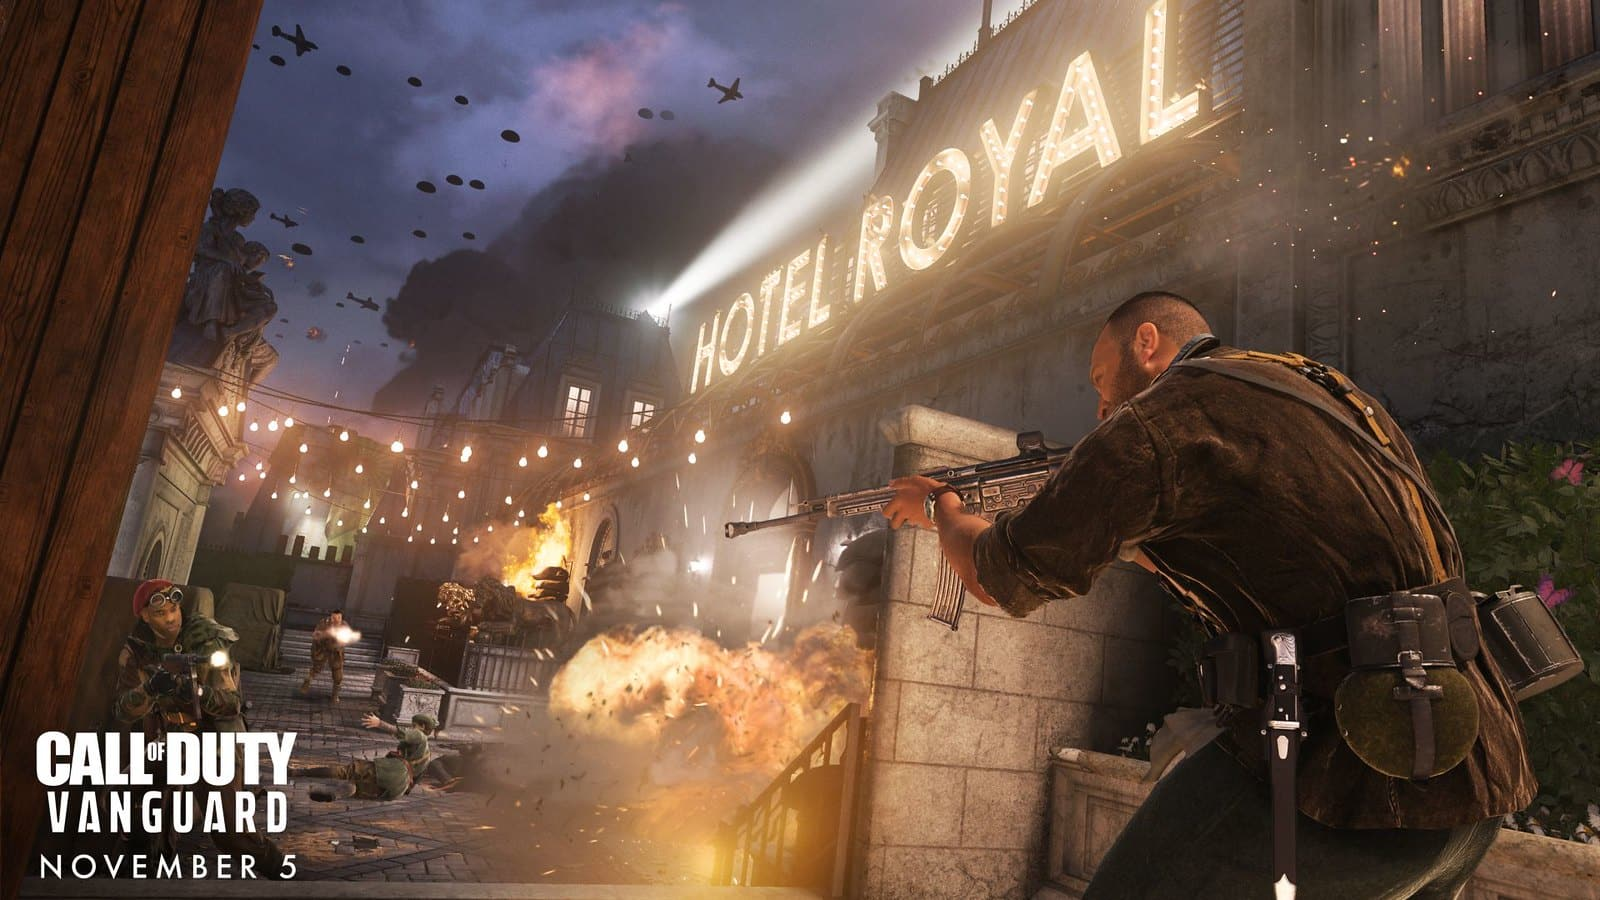 Call of Duty: Vanguard Beta and Multiplayer